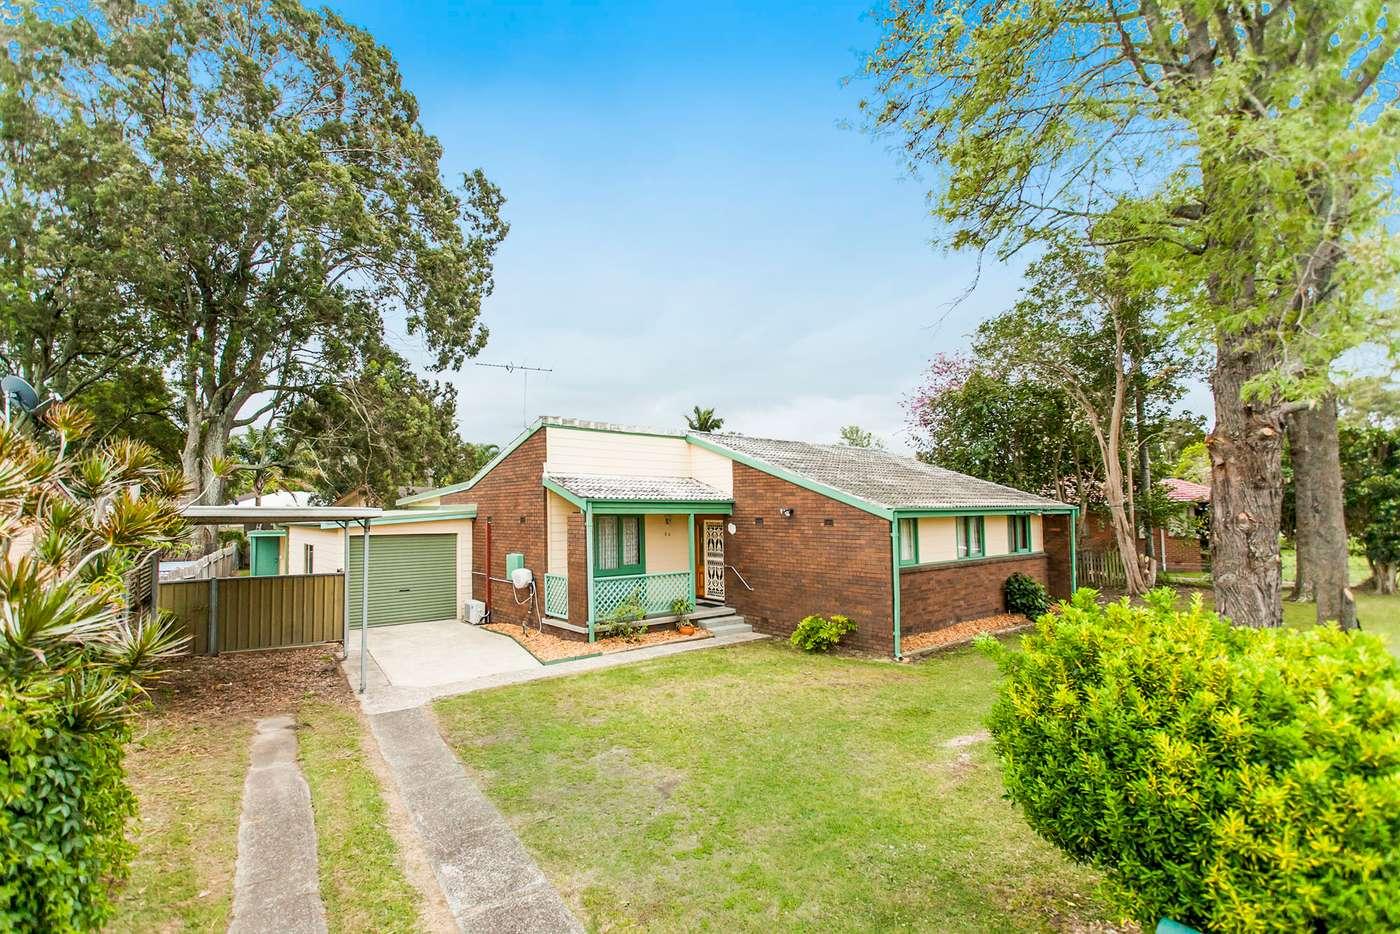 Main view of Homely house listing, 20 Watt Street, Raymond Terrace NSW 2324